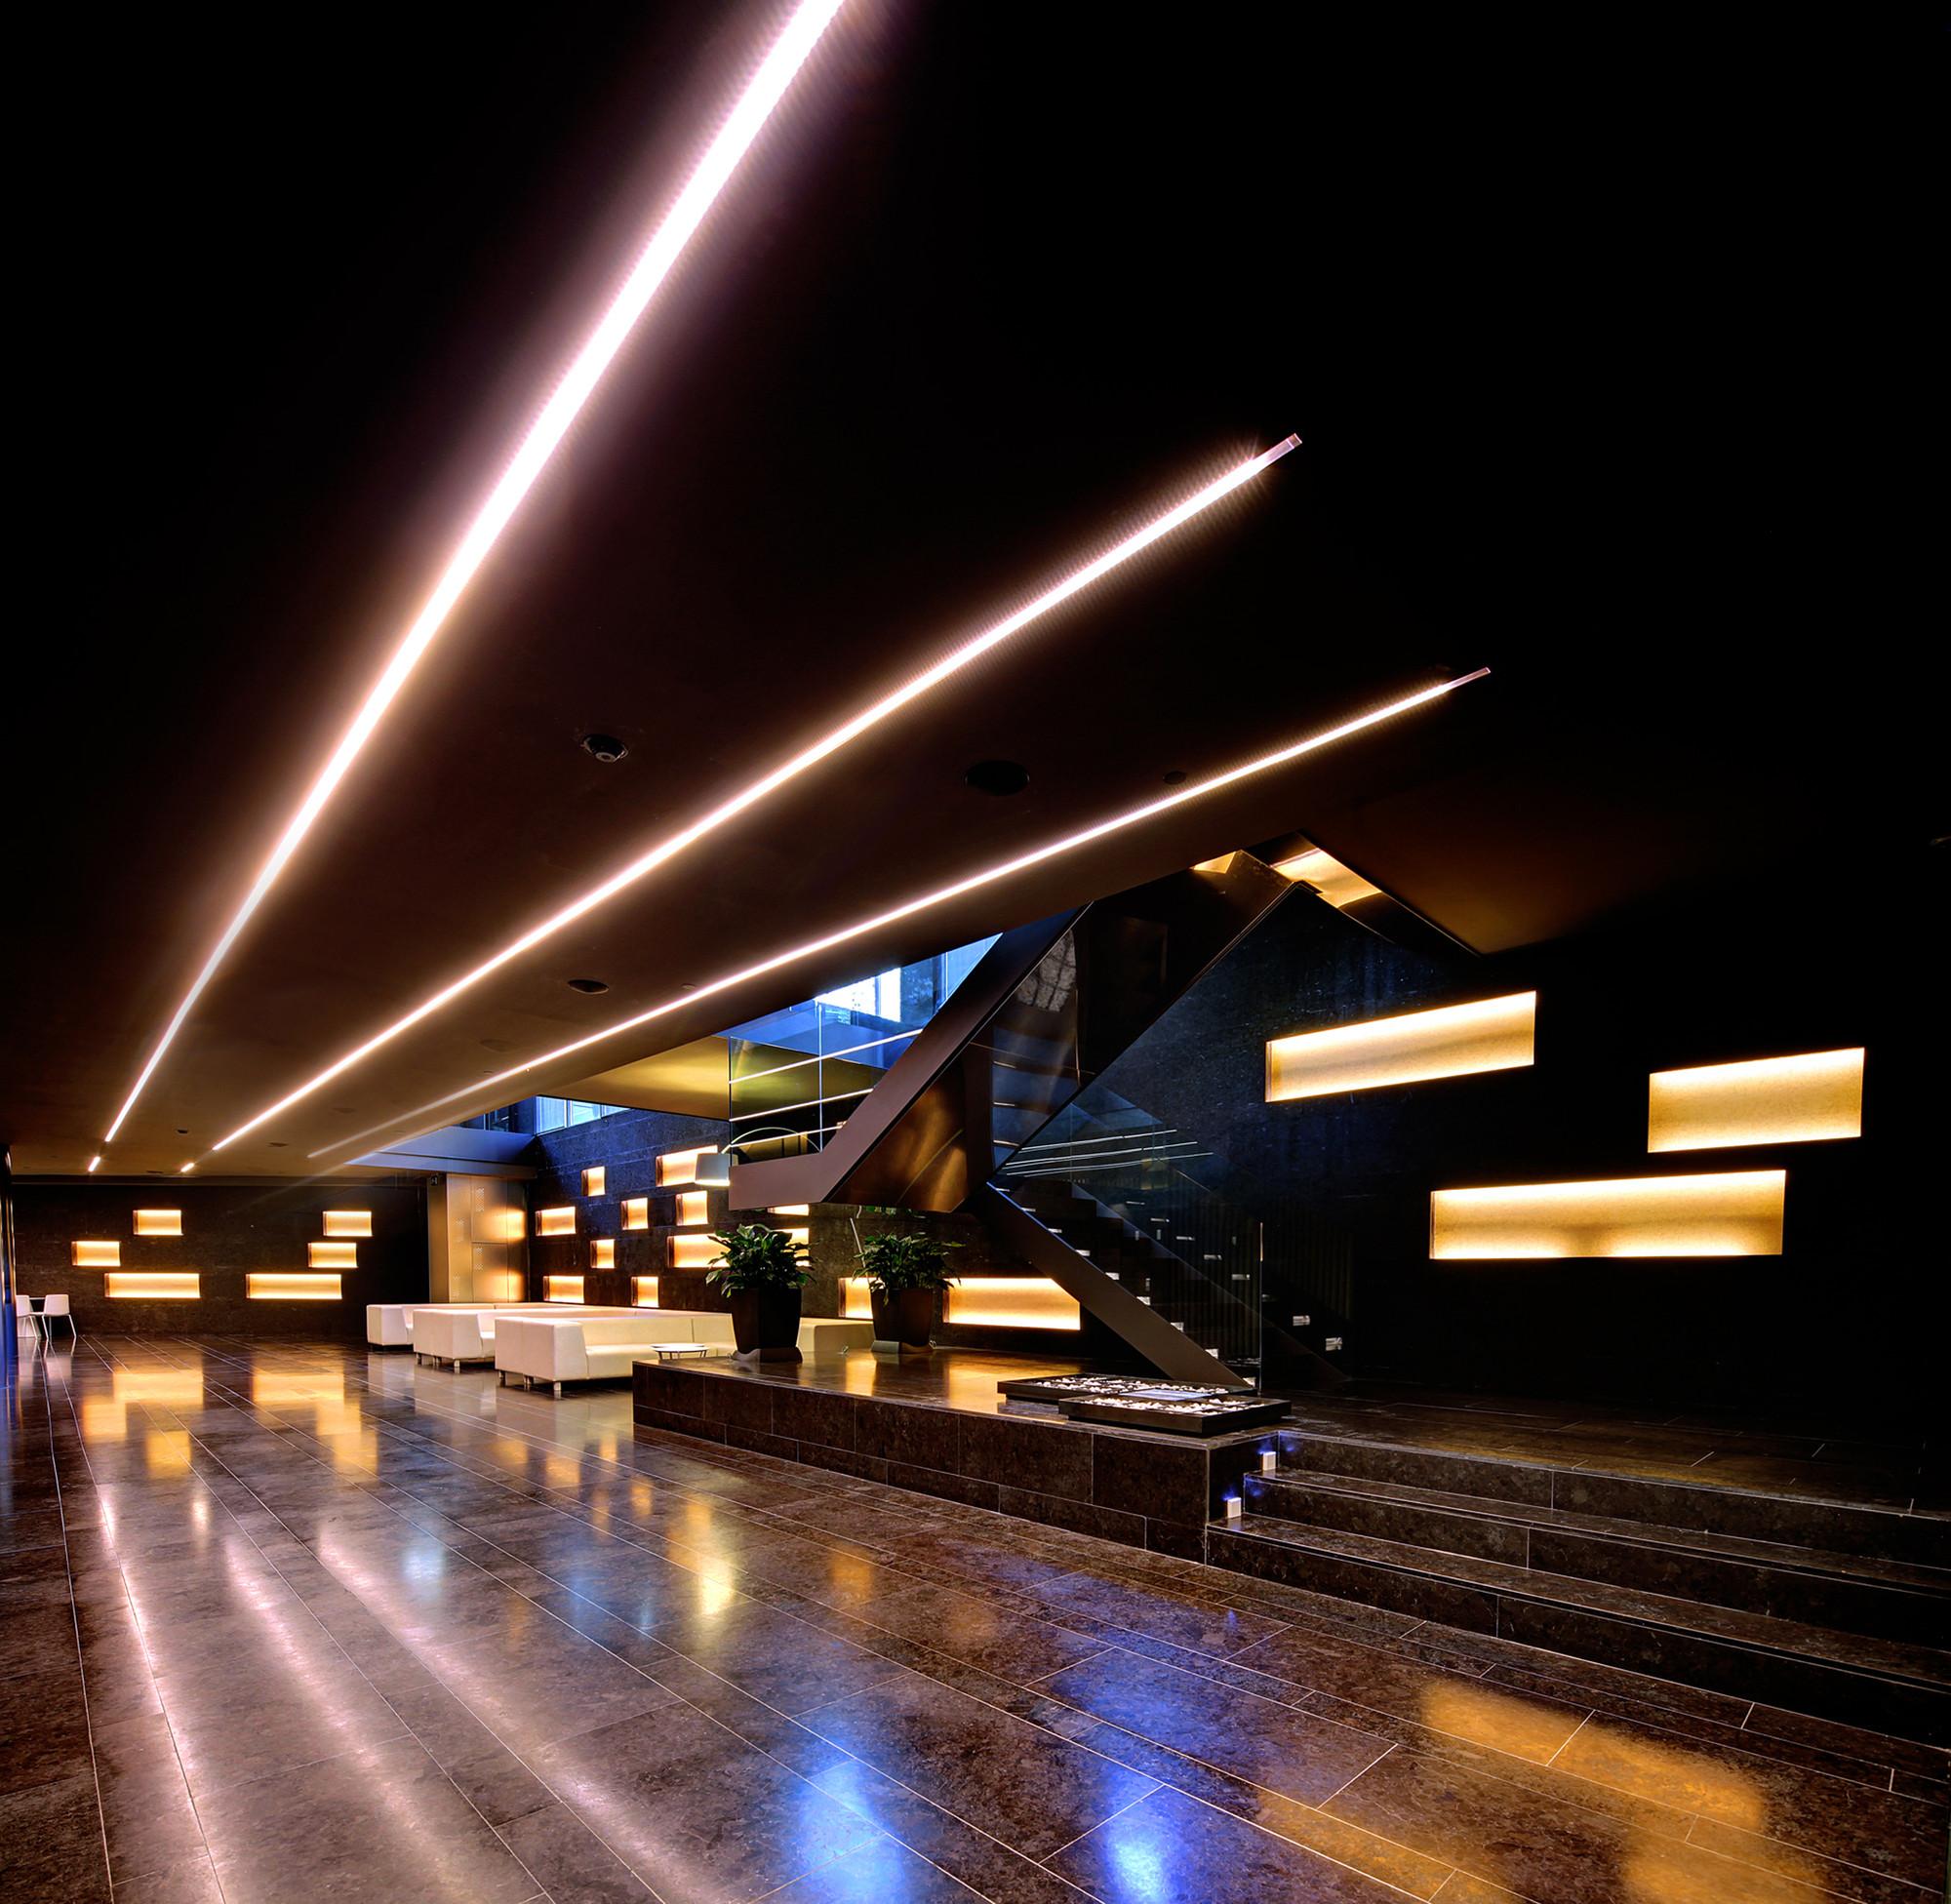 Gallery of olivia balmes hotel lex ib ez walter sara for Ruxxa design hotel 3